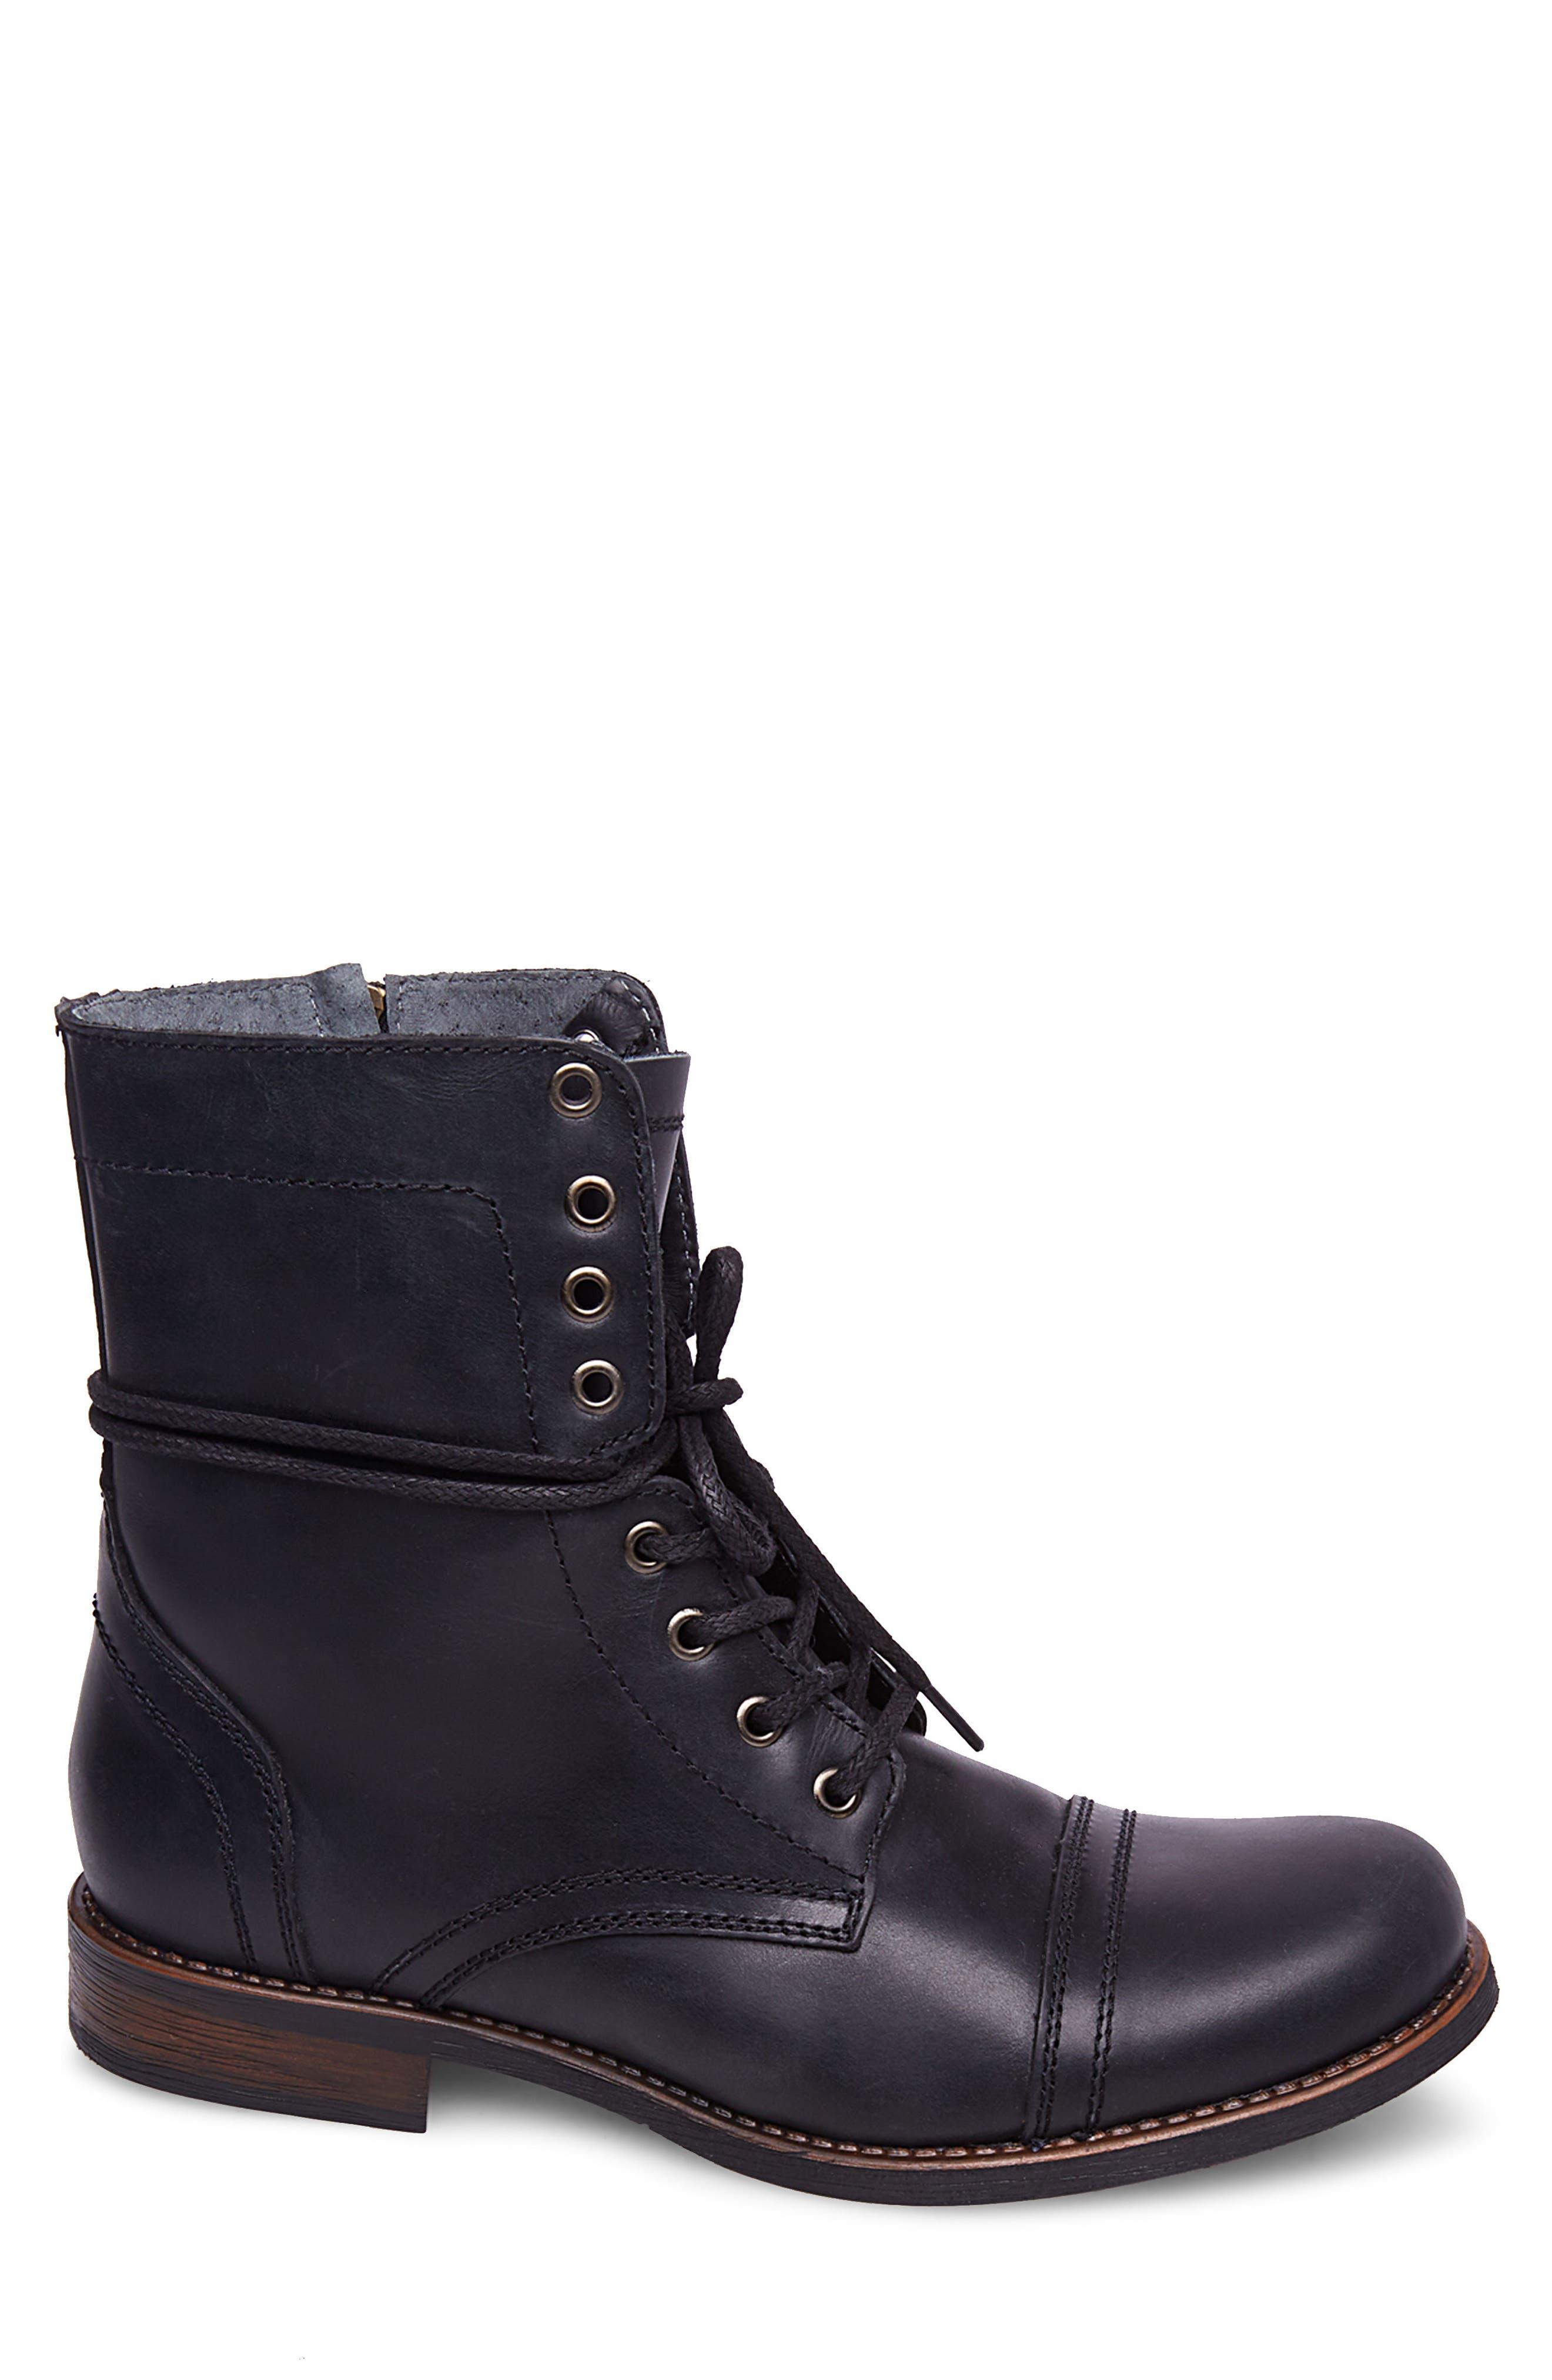 Troopah-C Cap Toe Boot,                             Alternate thumbnail 3, color,                             Black Leather